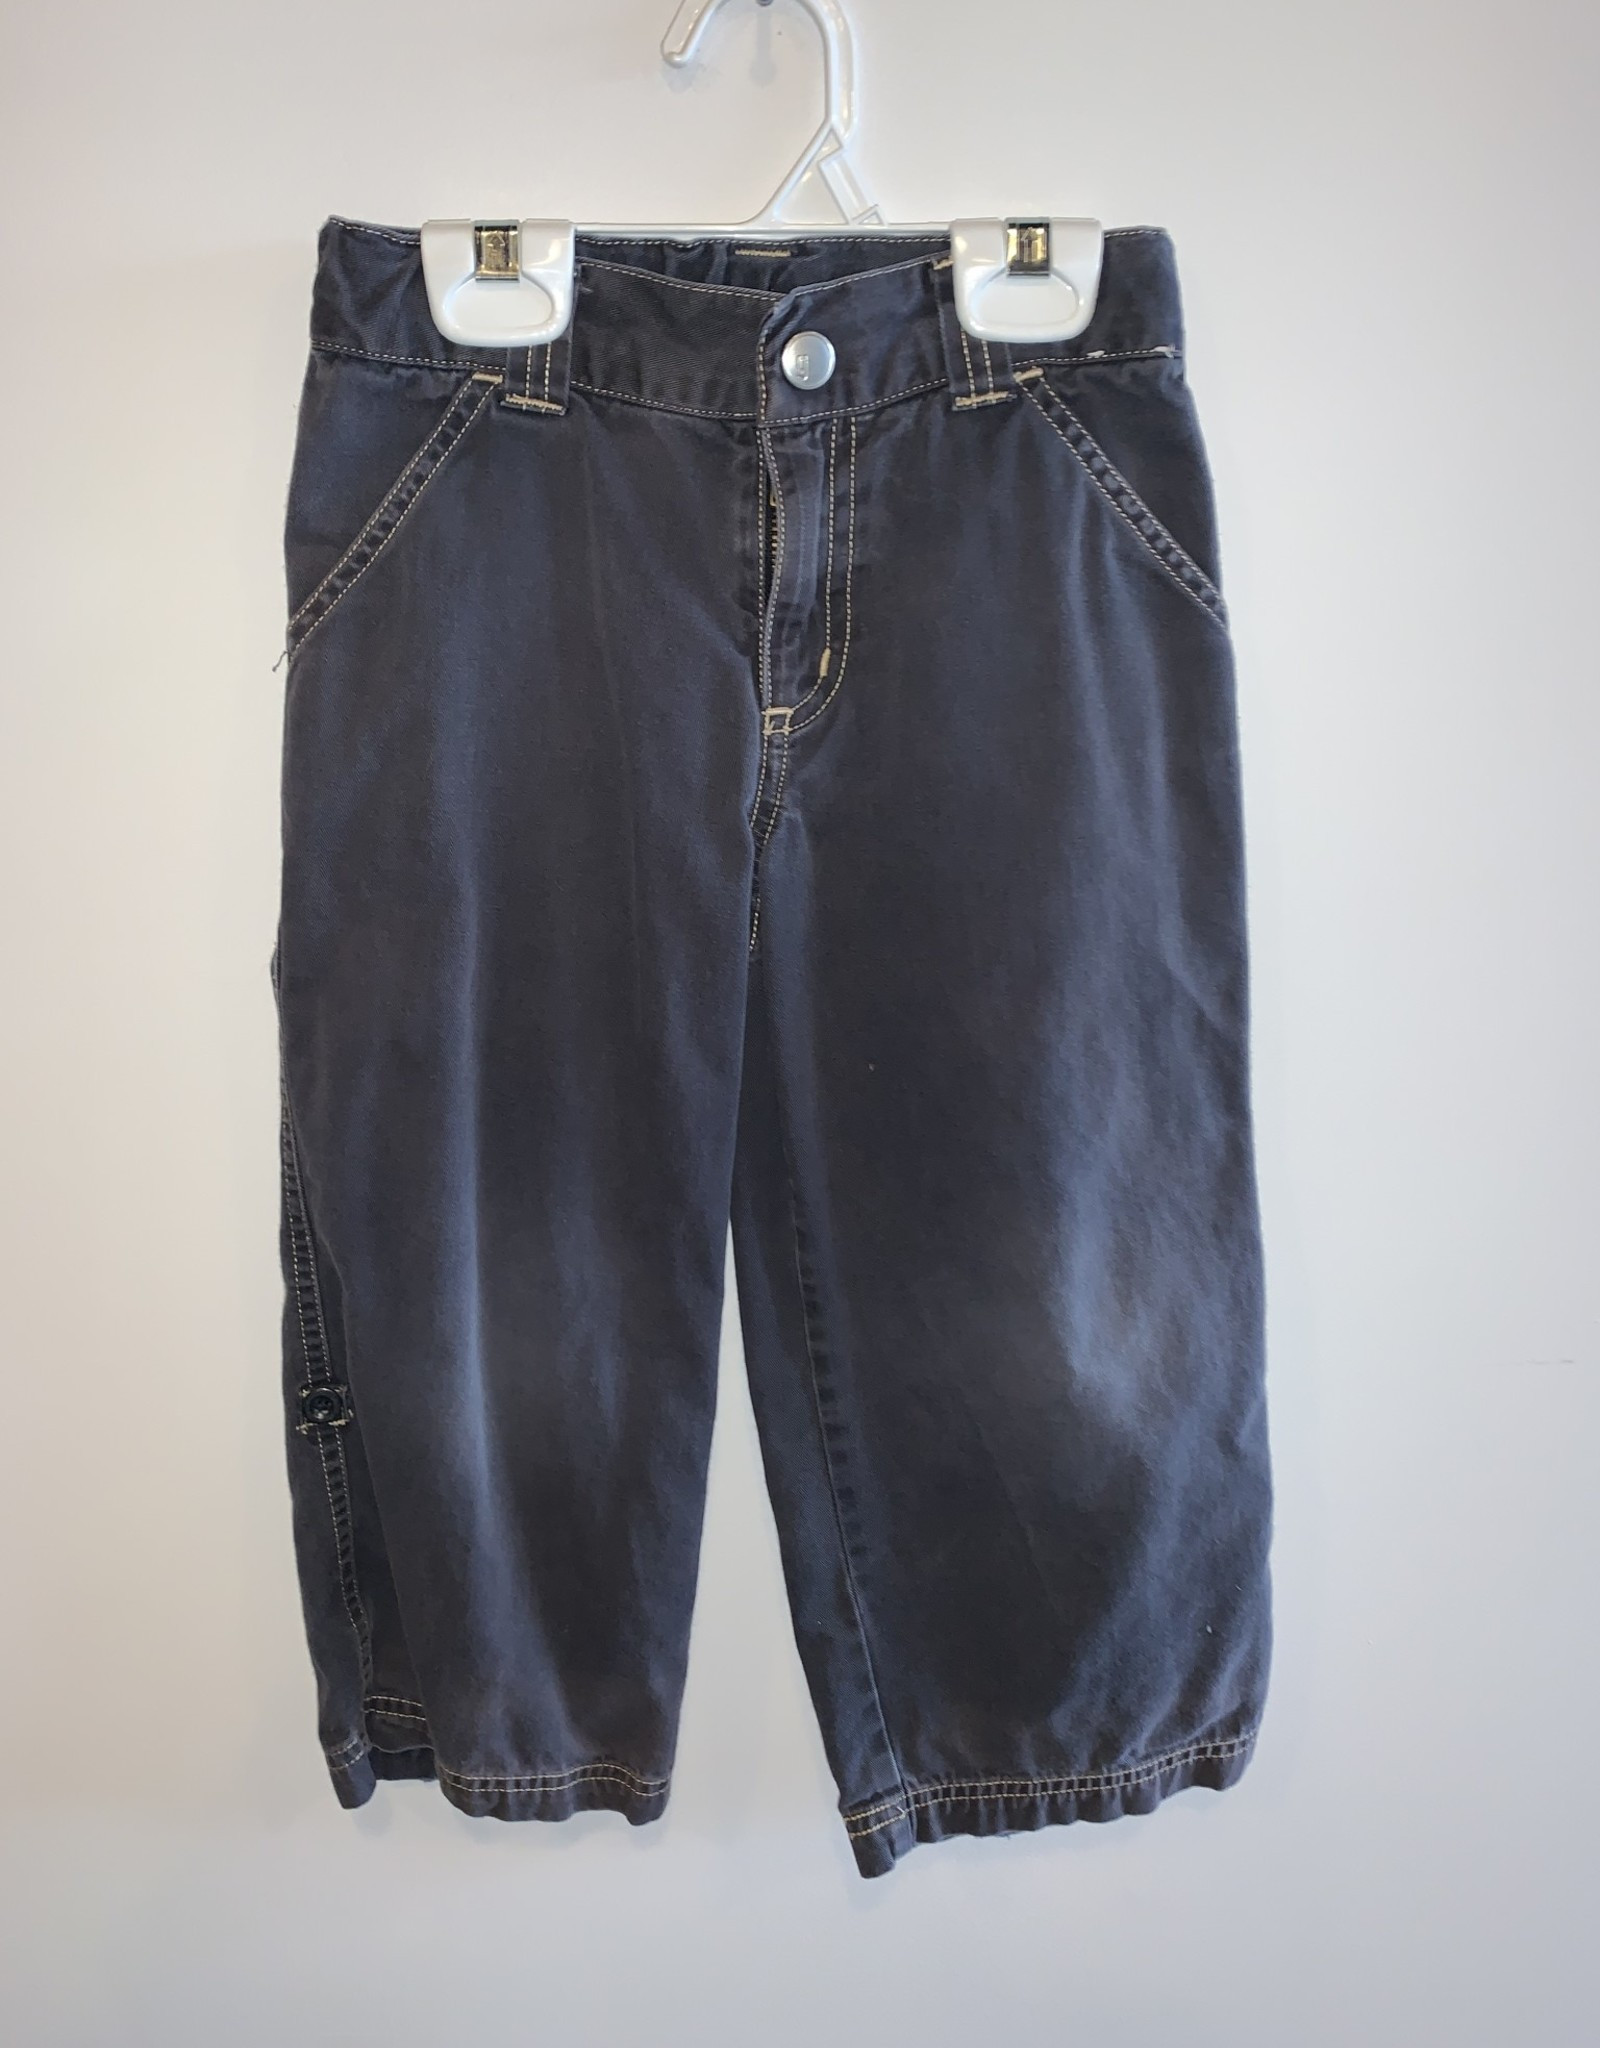 Gymboree Boys/4T/Gymboree/Pants